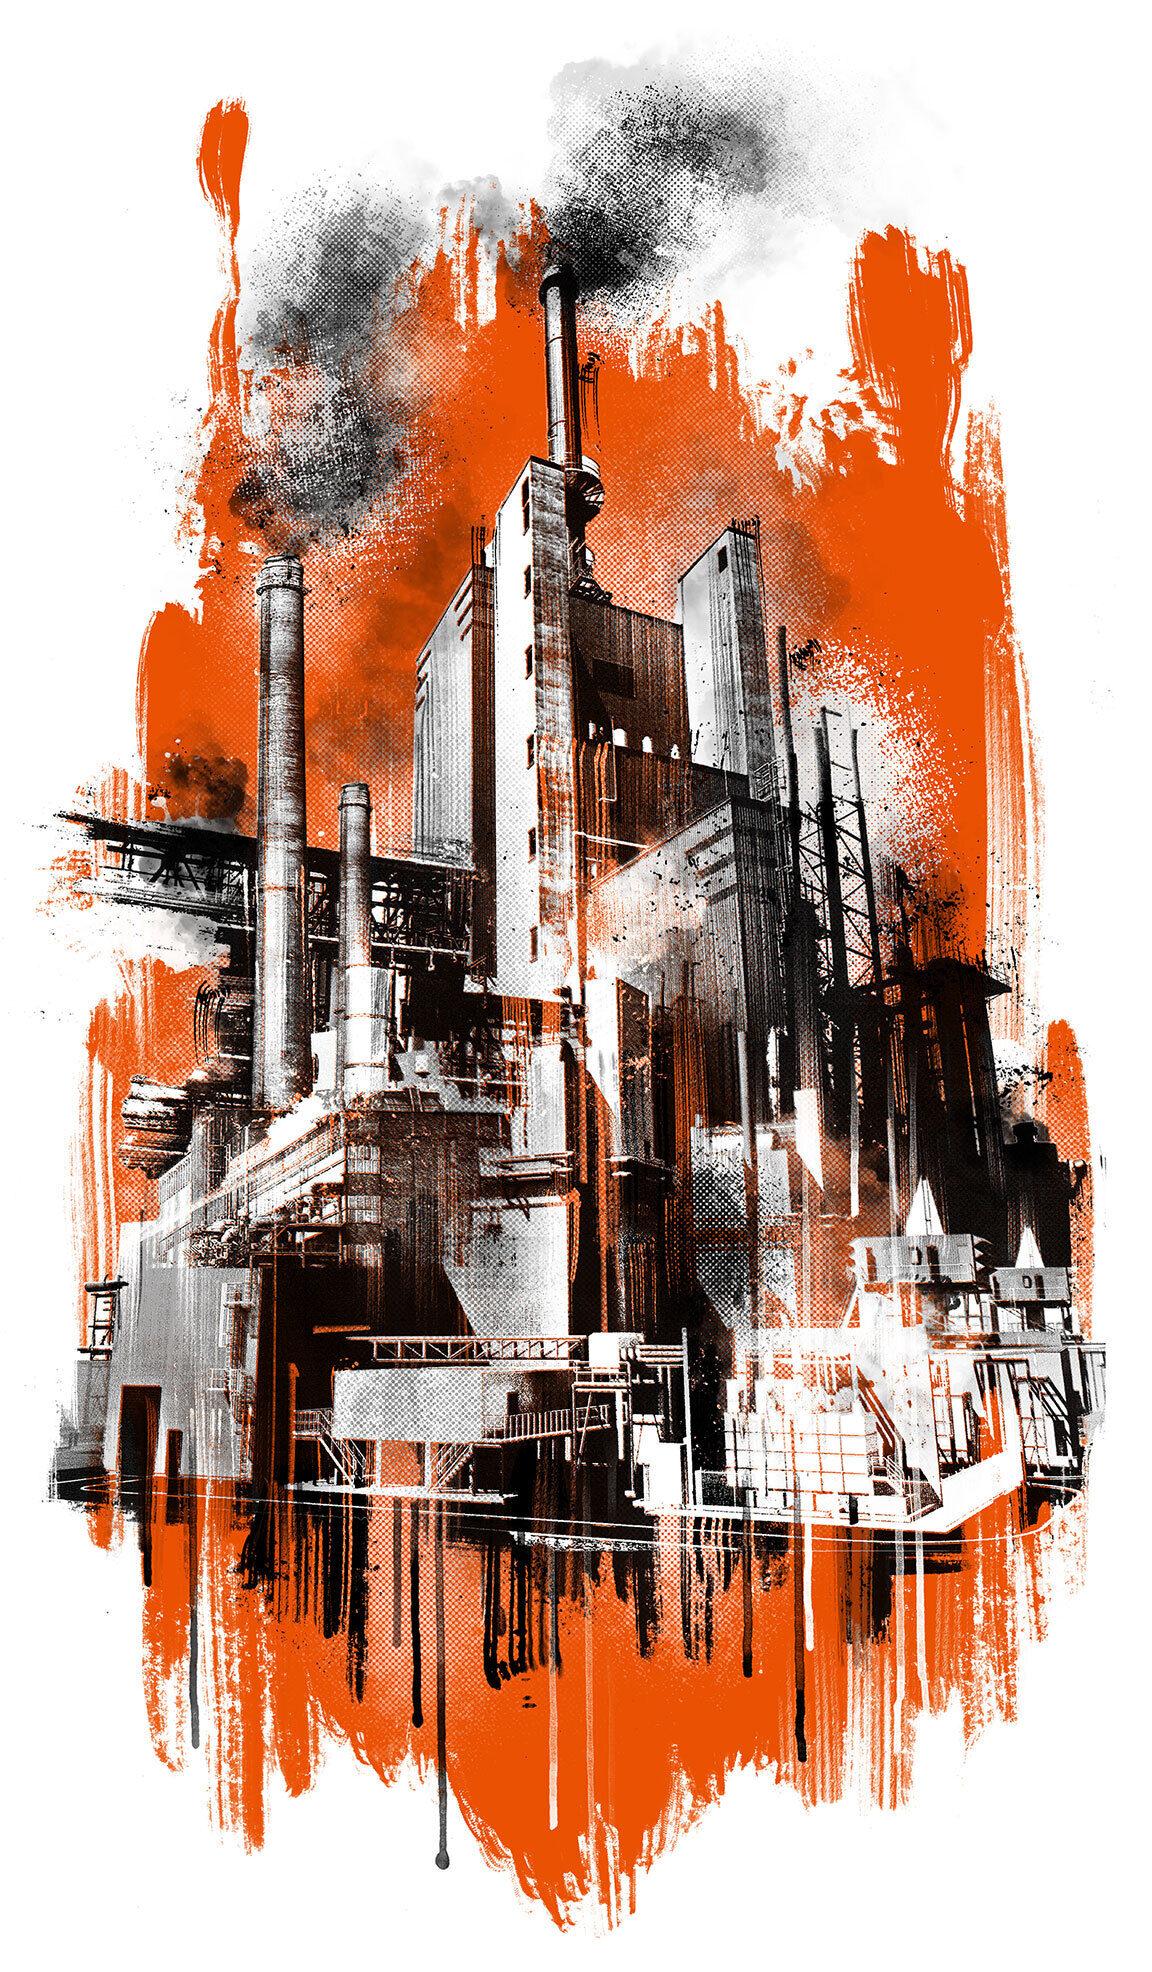 Konzern initiative - Kornel Illustration | Kornel Stadler portfolio